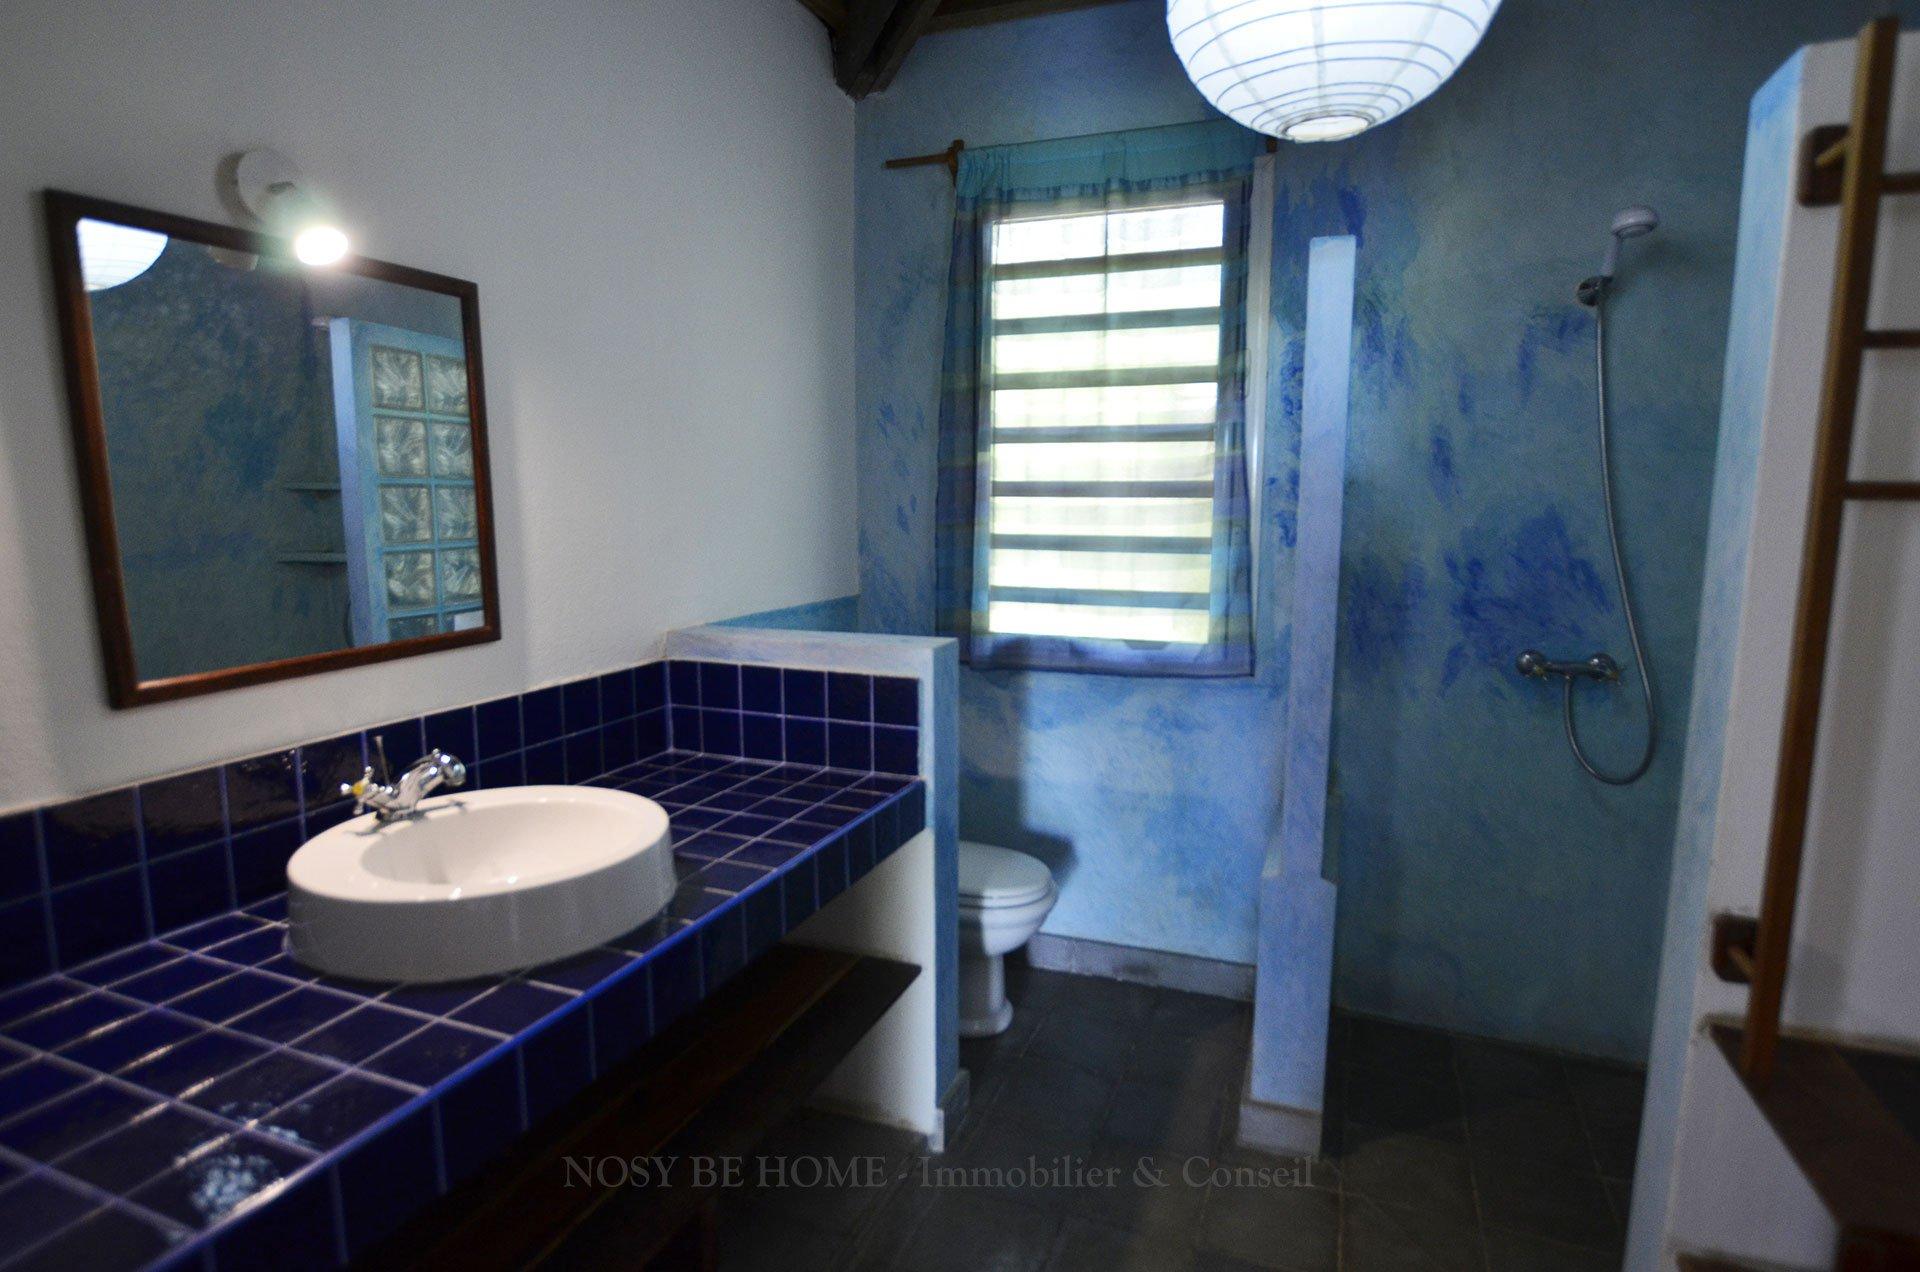 Sale Villa - Nosy Be - Madagascar - 320,000 €